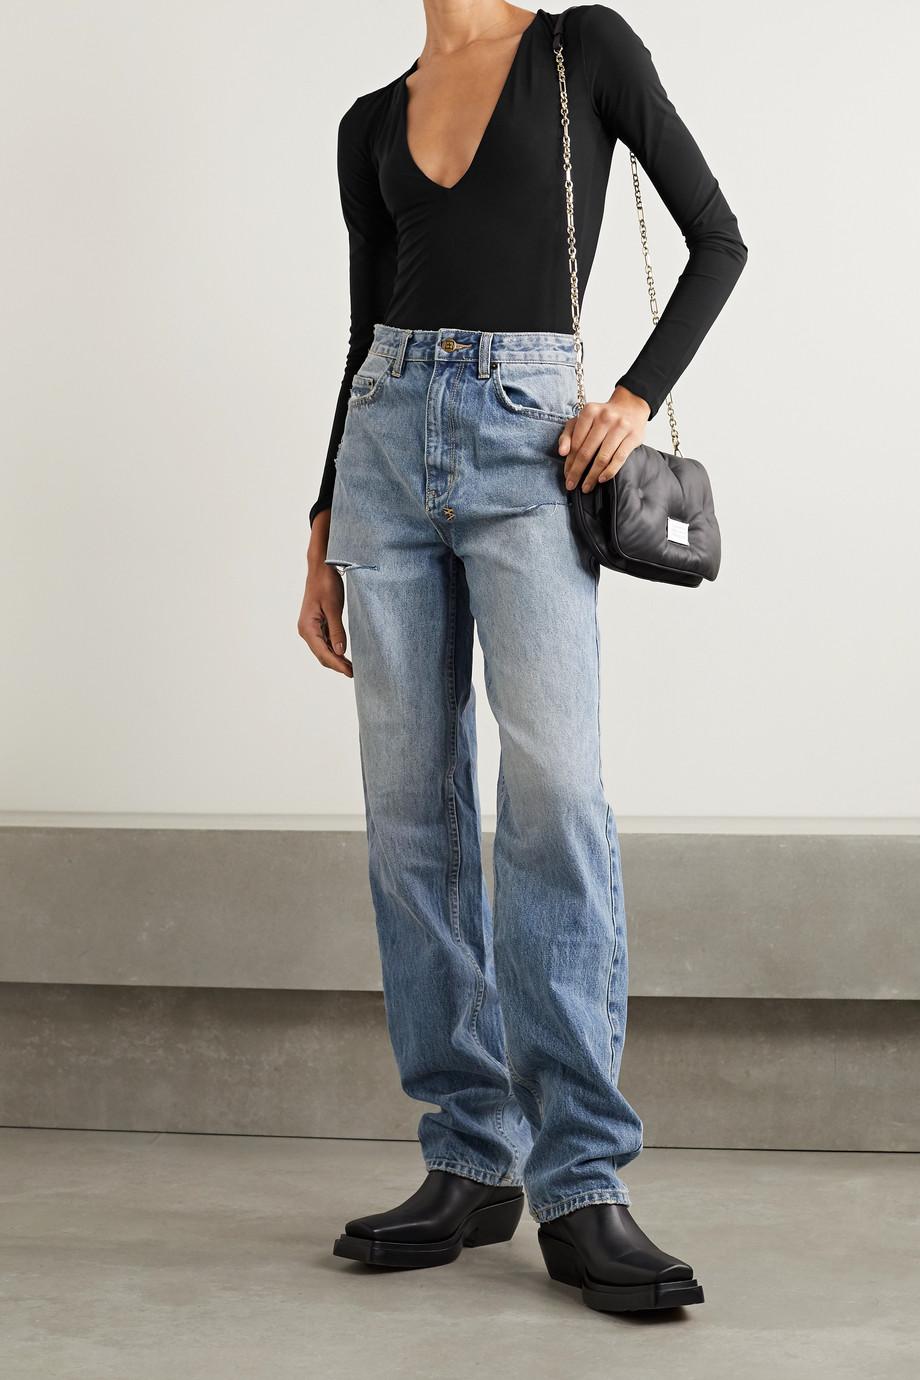 Alix NYC Irving 弹力平纹布连体丁字裤式紧身衣